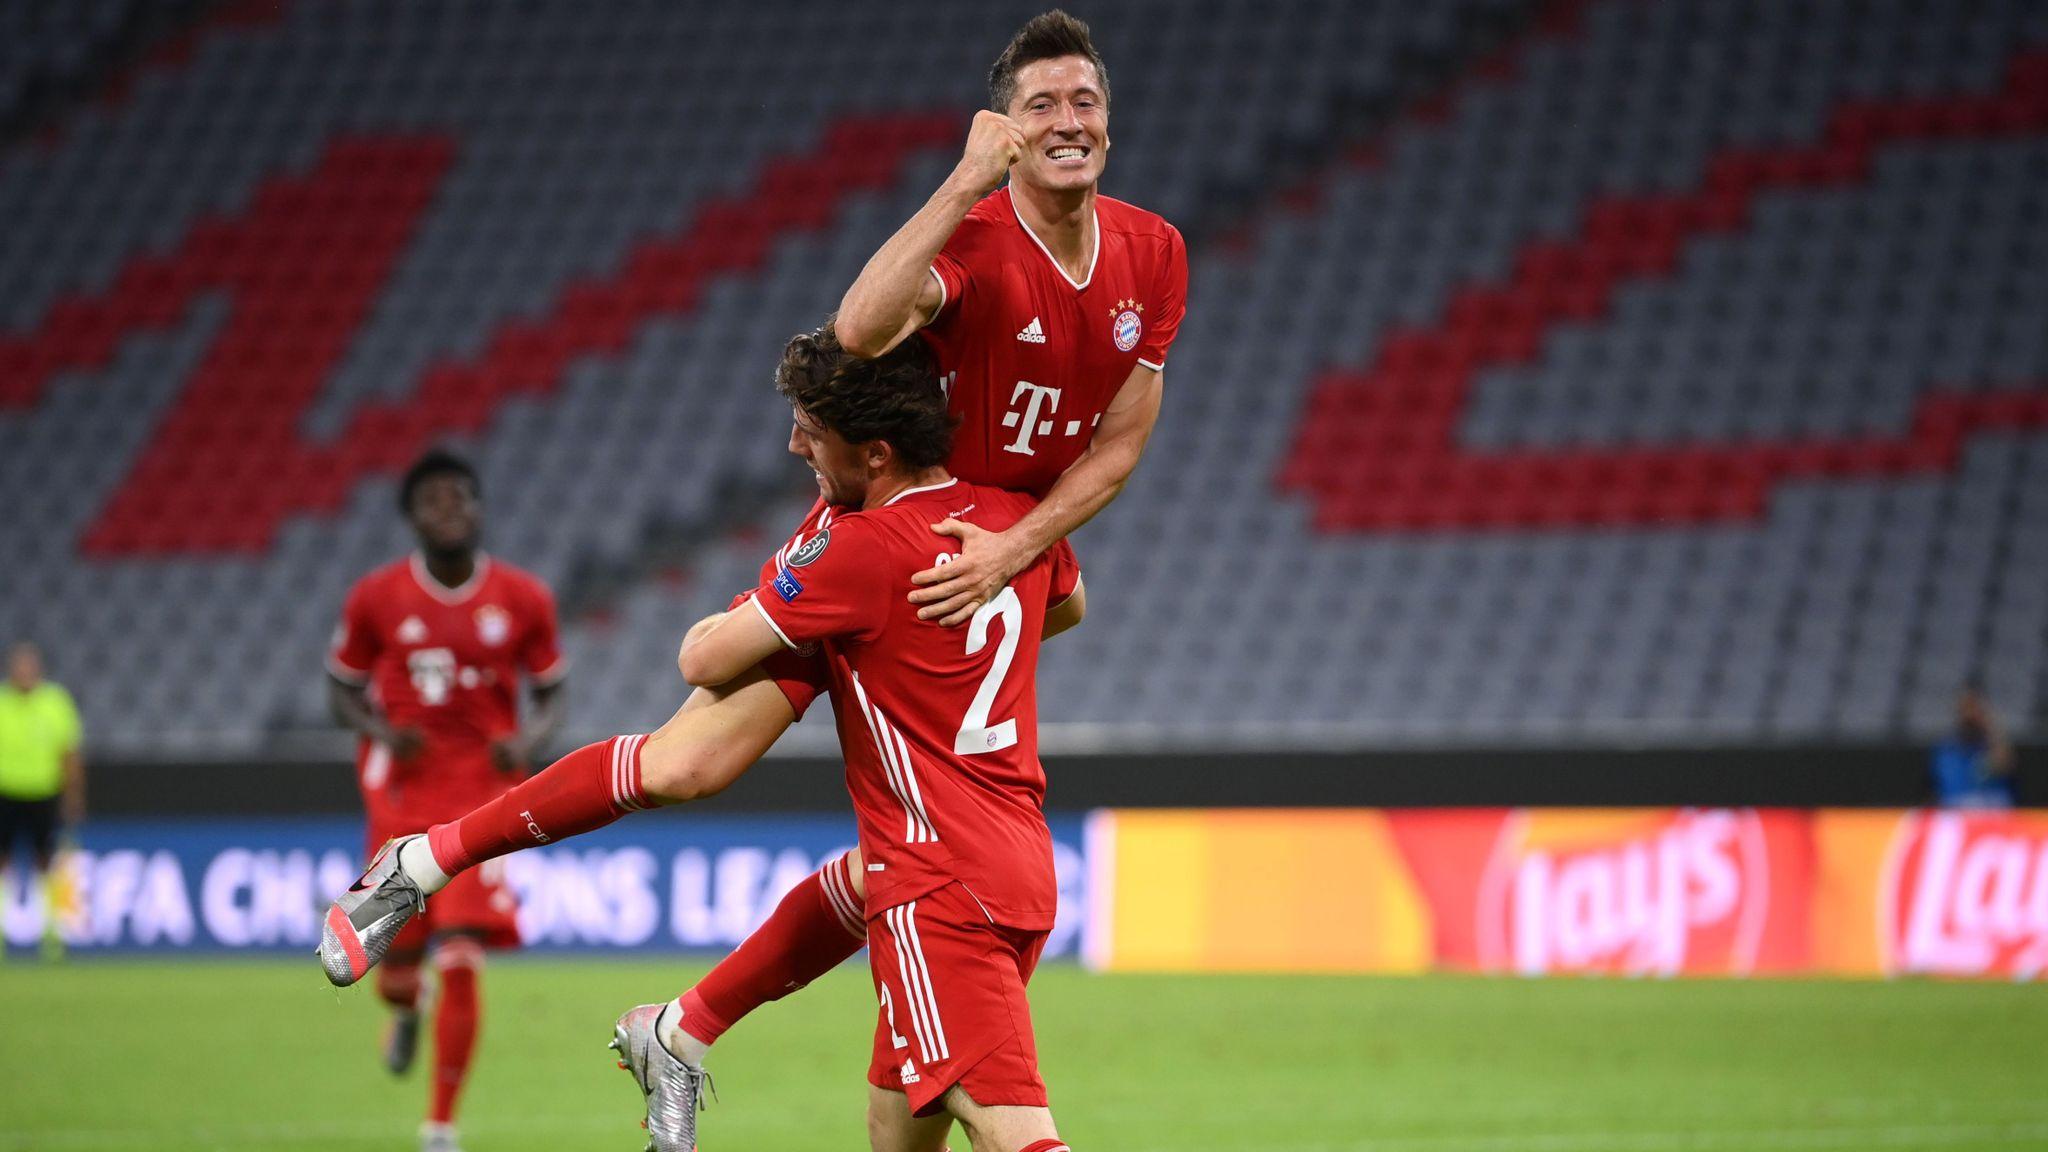 Lewandowski was at his best again on Saturday against Chelsea